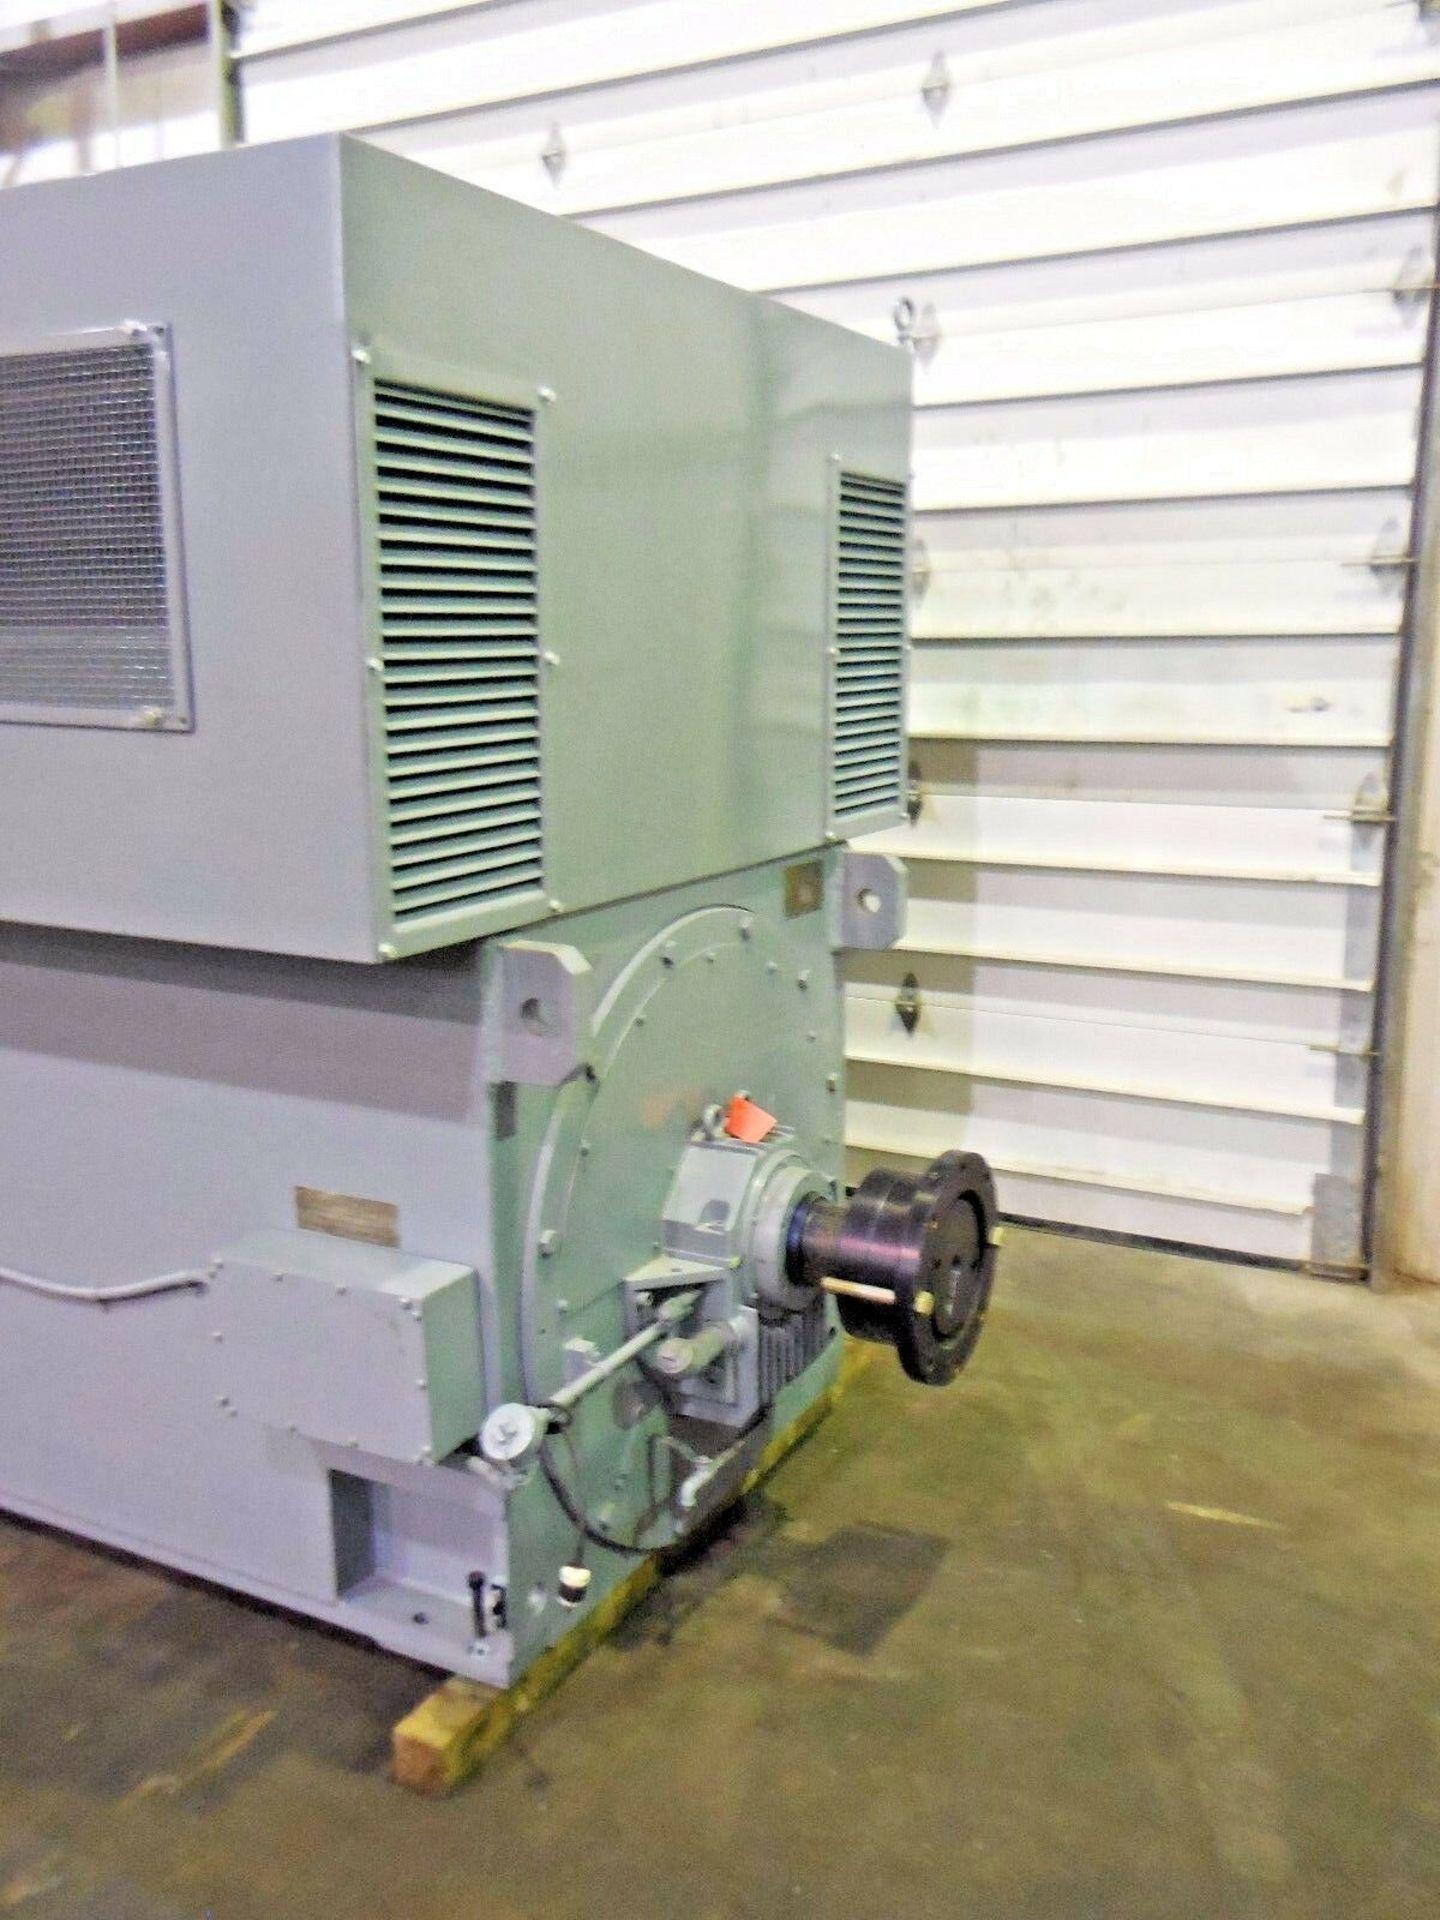 Westinghouse 2500 HP Induction Motor. 1190 RPM. 5614. 4000 V. 3 Ph. 60 Hz. - Image 2 of 4